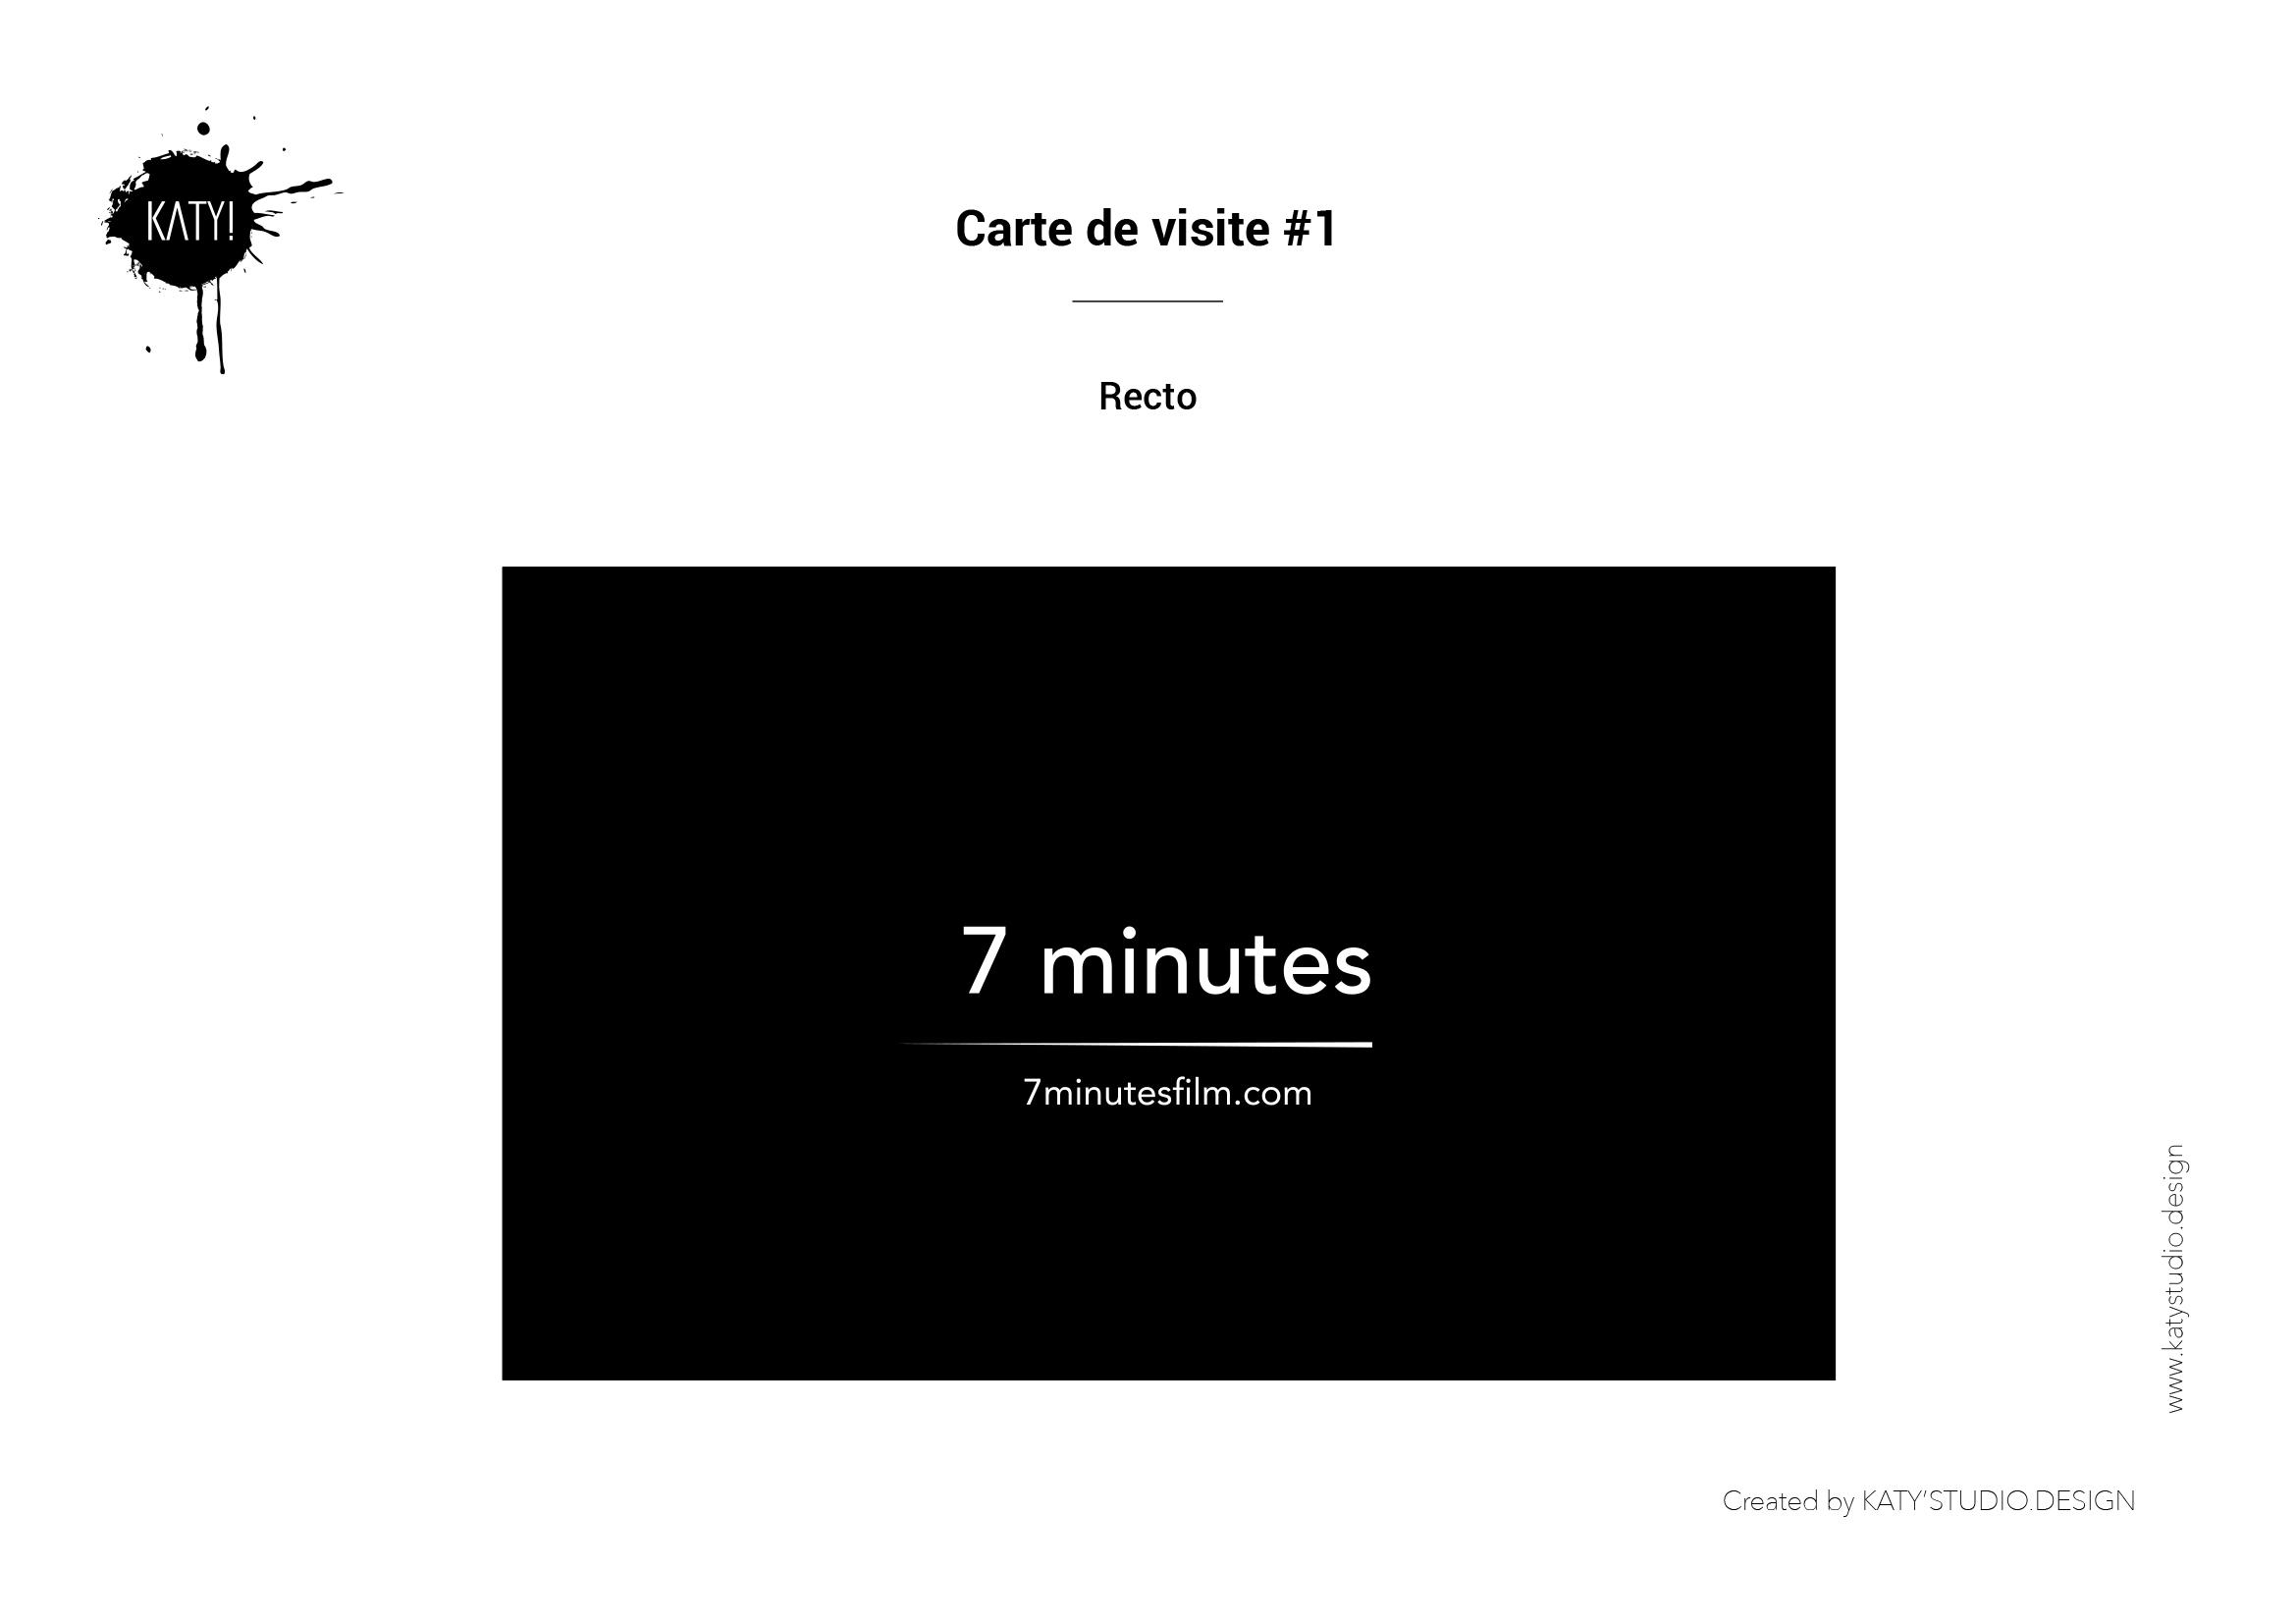 7min_carte-de-visite_info-3